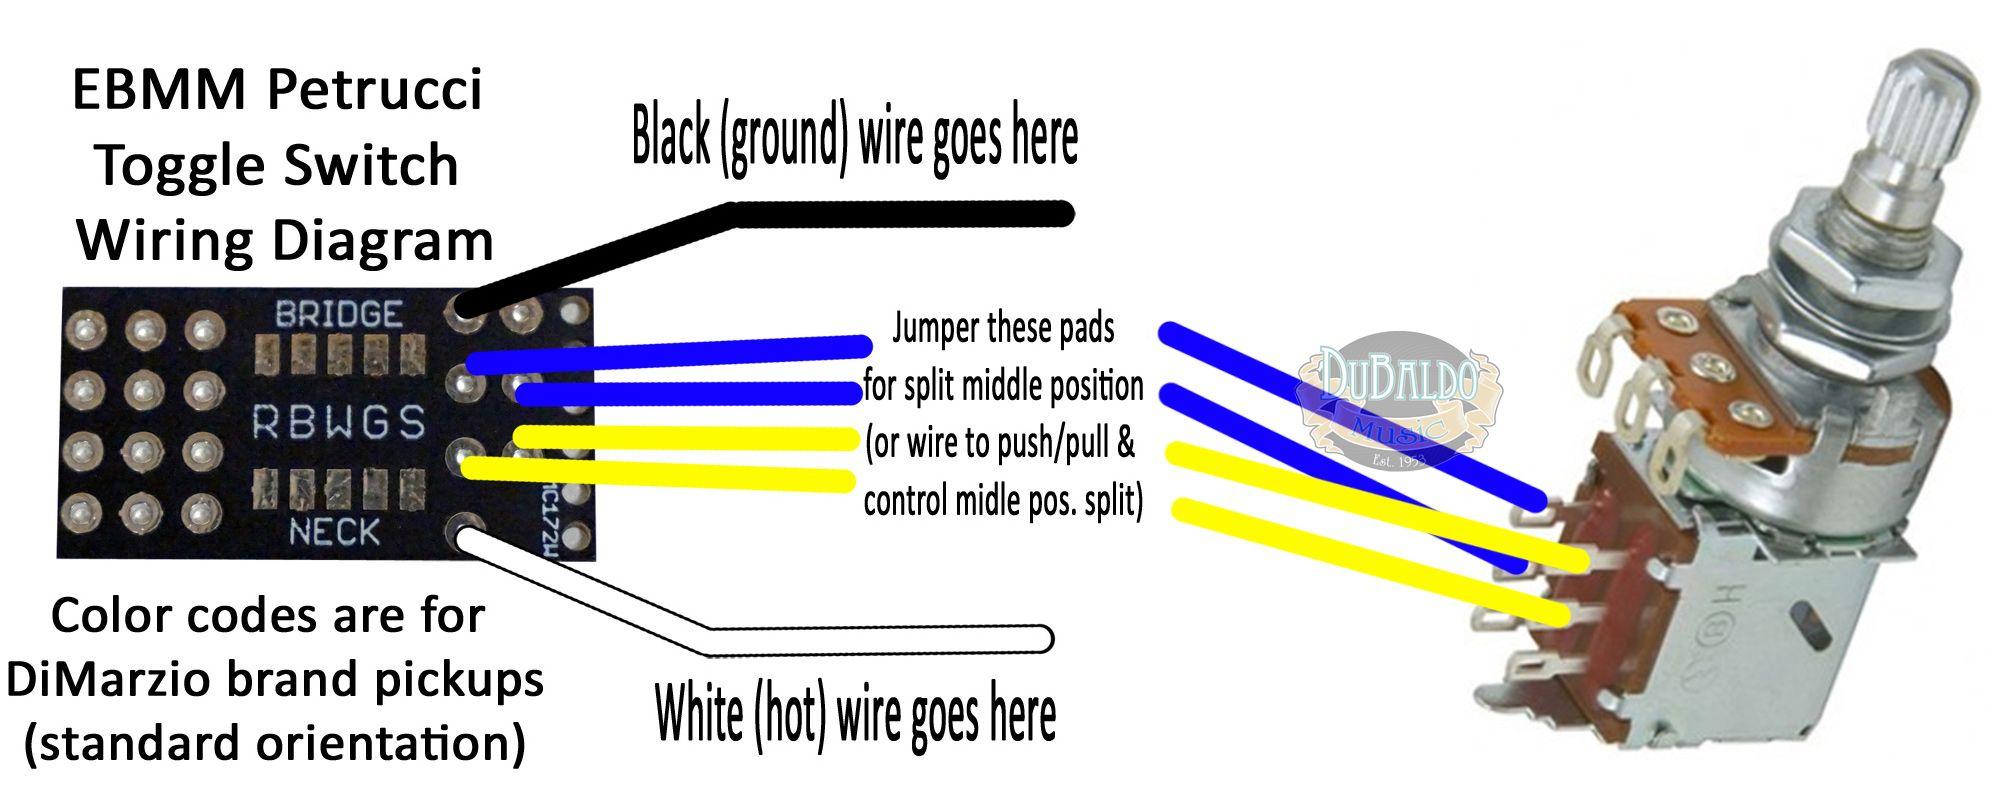 Push Pull Coil Tap Wiring Diagram | Manual E-Books - Coil Tap Wiring Diagram Push Pull